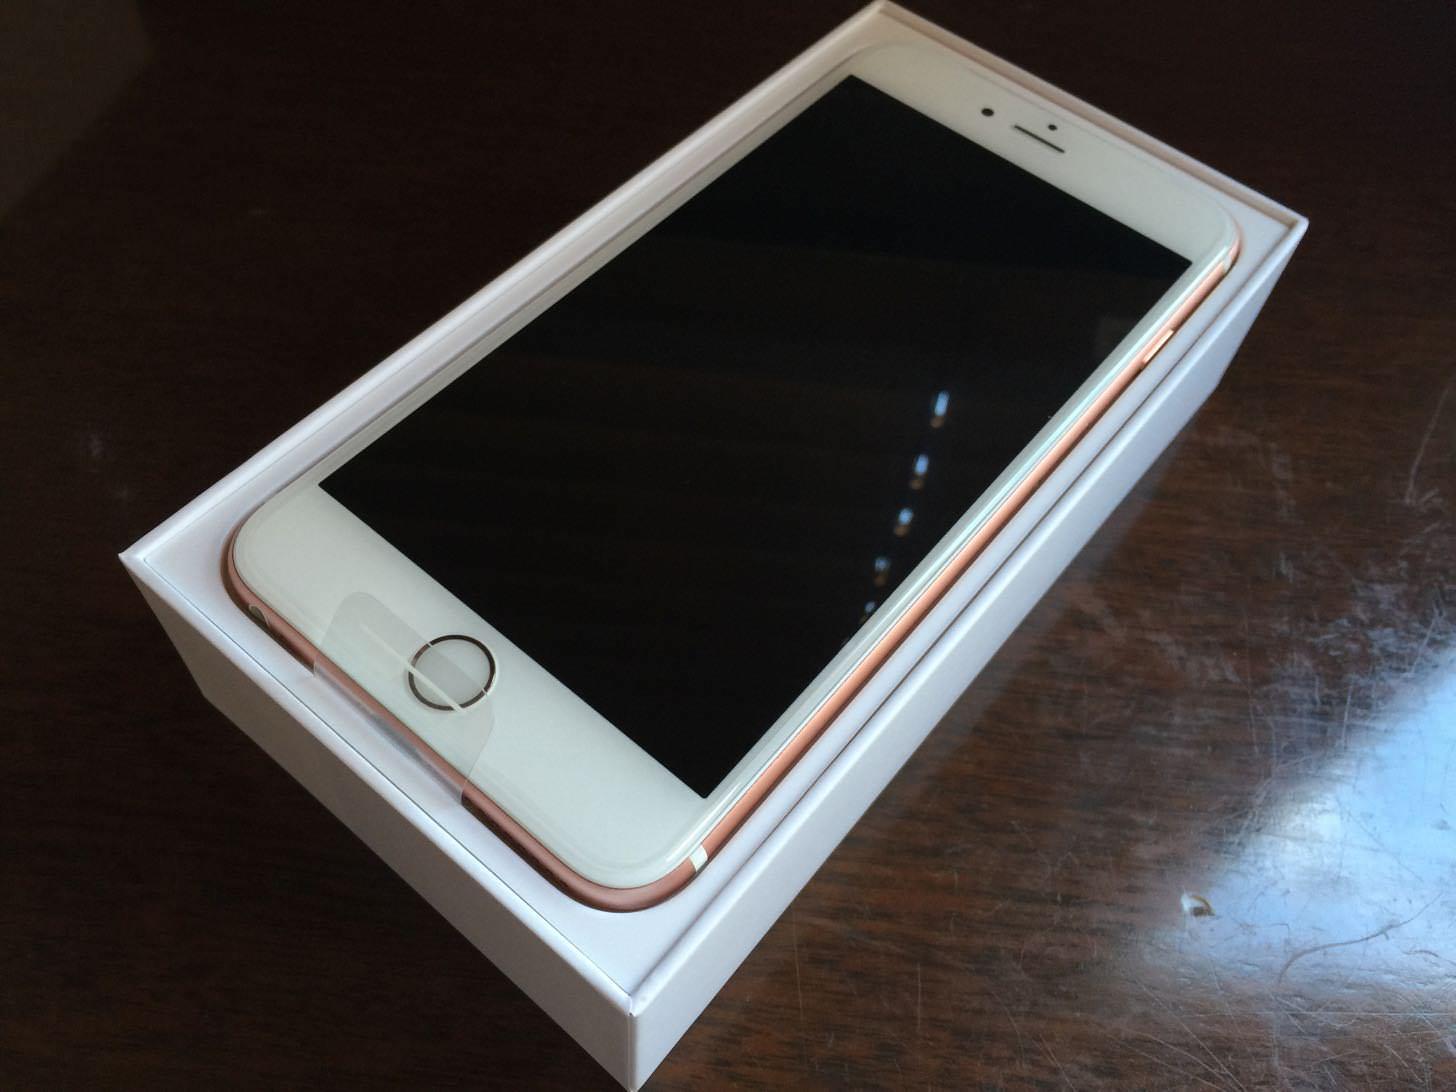 iPhone 6s Plus ローズゴールド 64GBを開封!